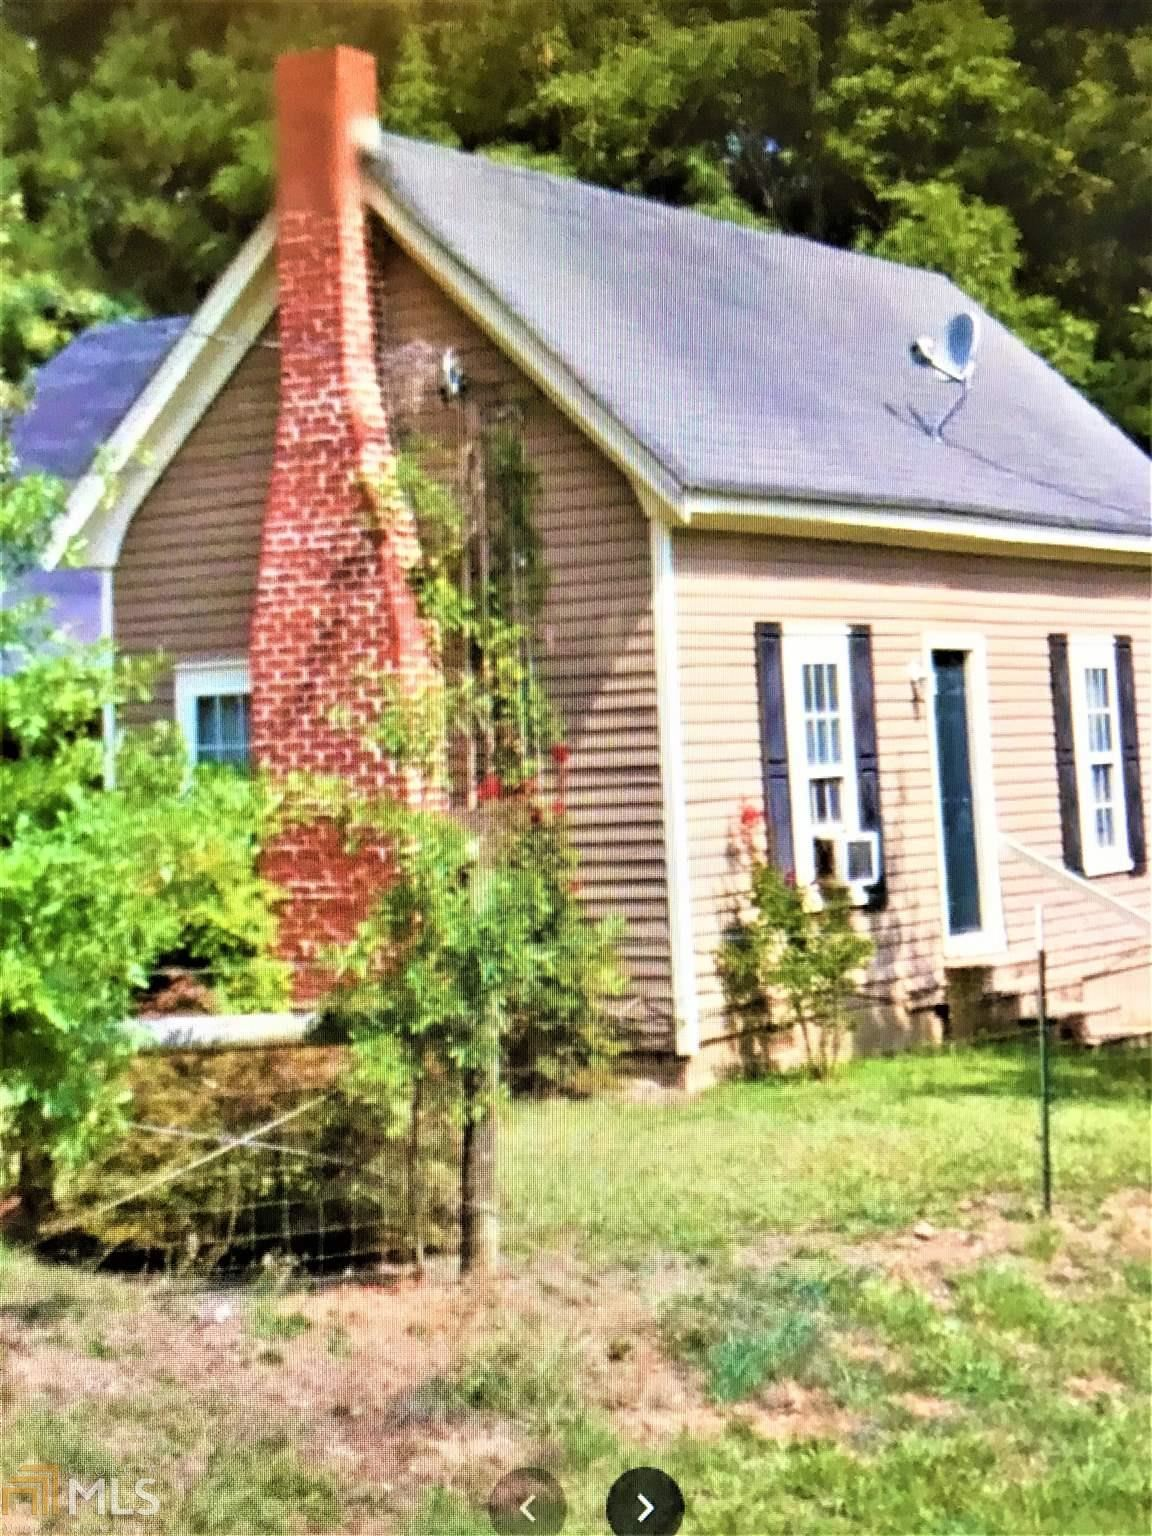 107 Bowden St, Locust Grove, GA 30248 - MLS#: 8827534